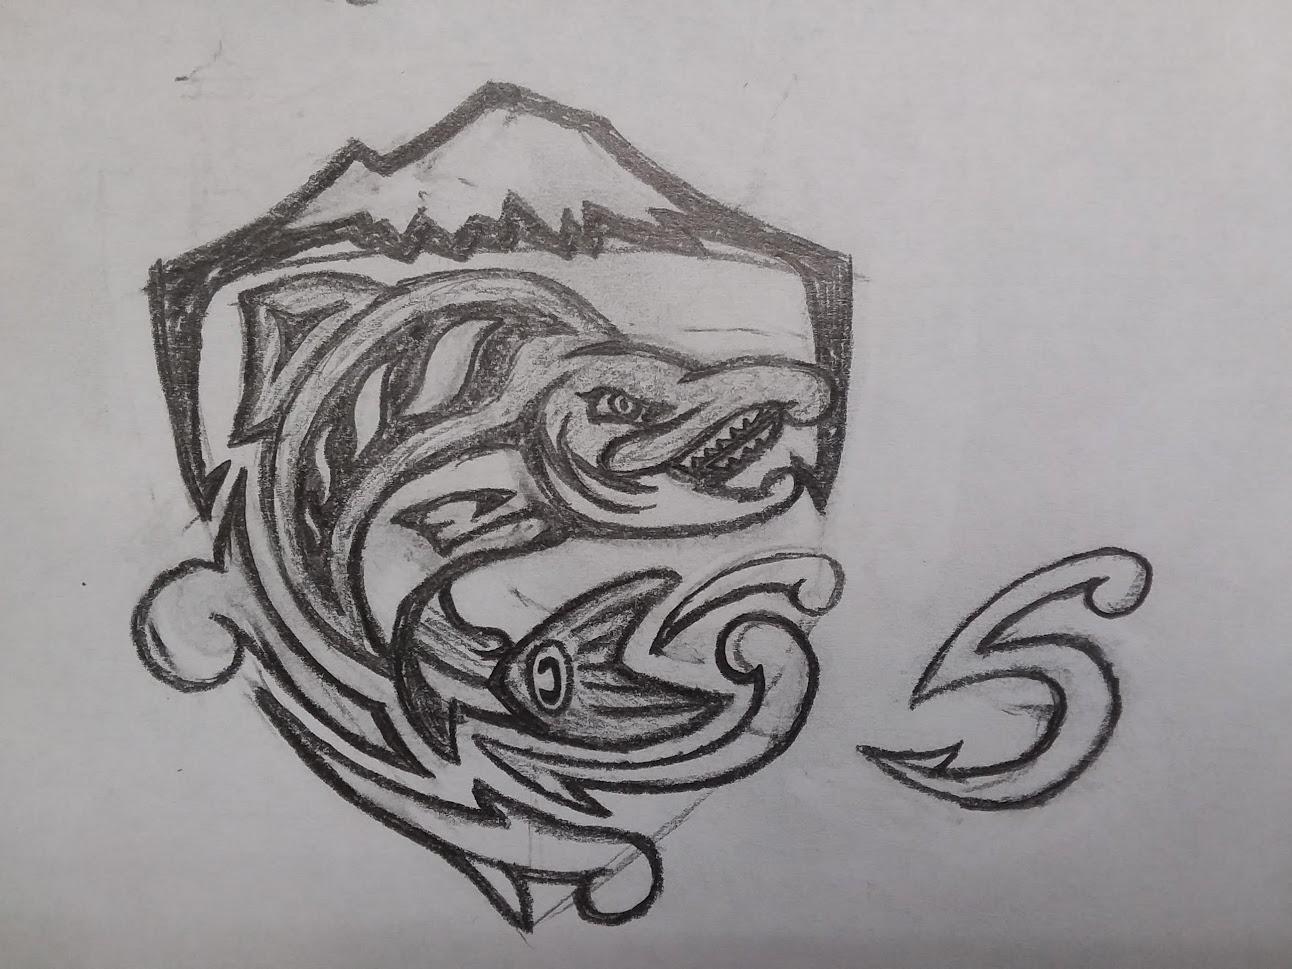 Seattle Sockeyes Concept Sketch - Shield / S sketch nhl seattle seattle salmon hockey nhl design logo mascot athletics sports